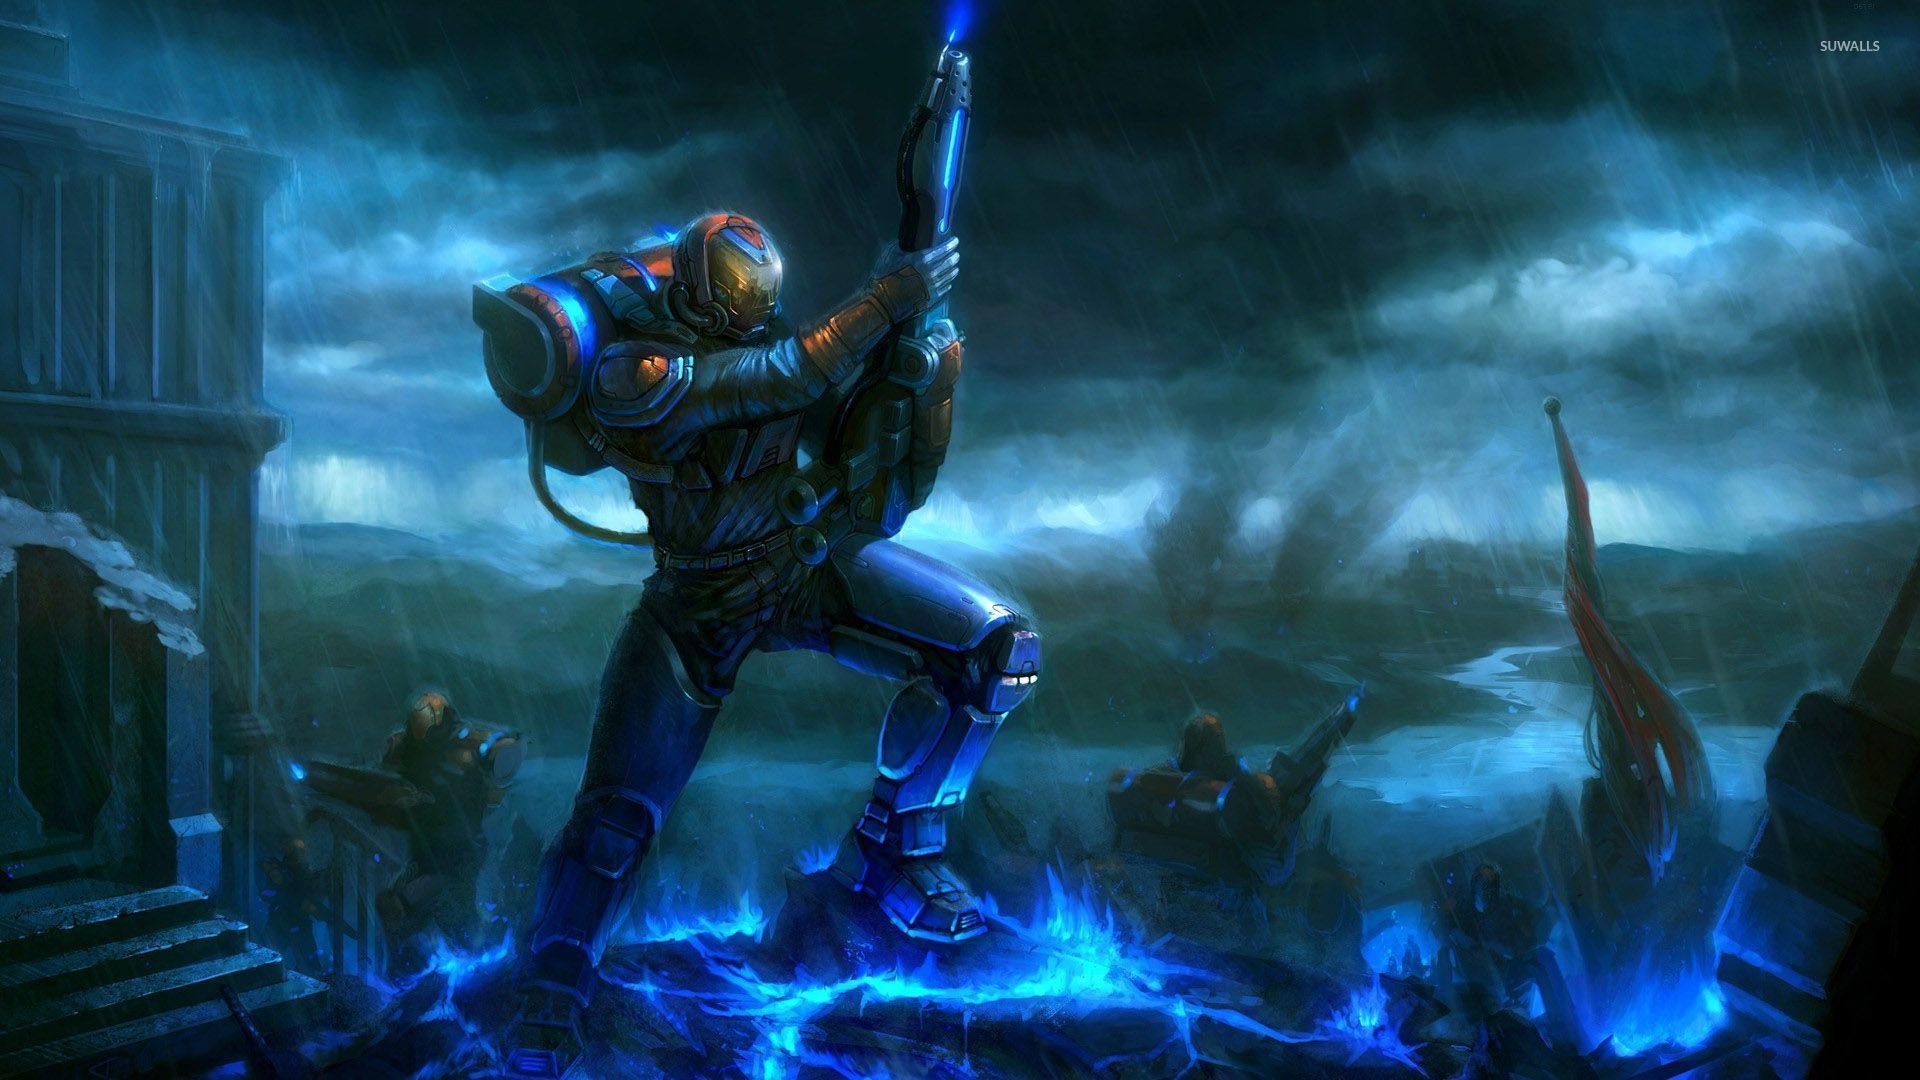 Halo Wars 4 Wallpaper Game Wallpapers 30330